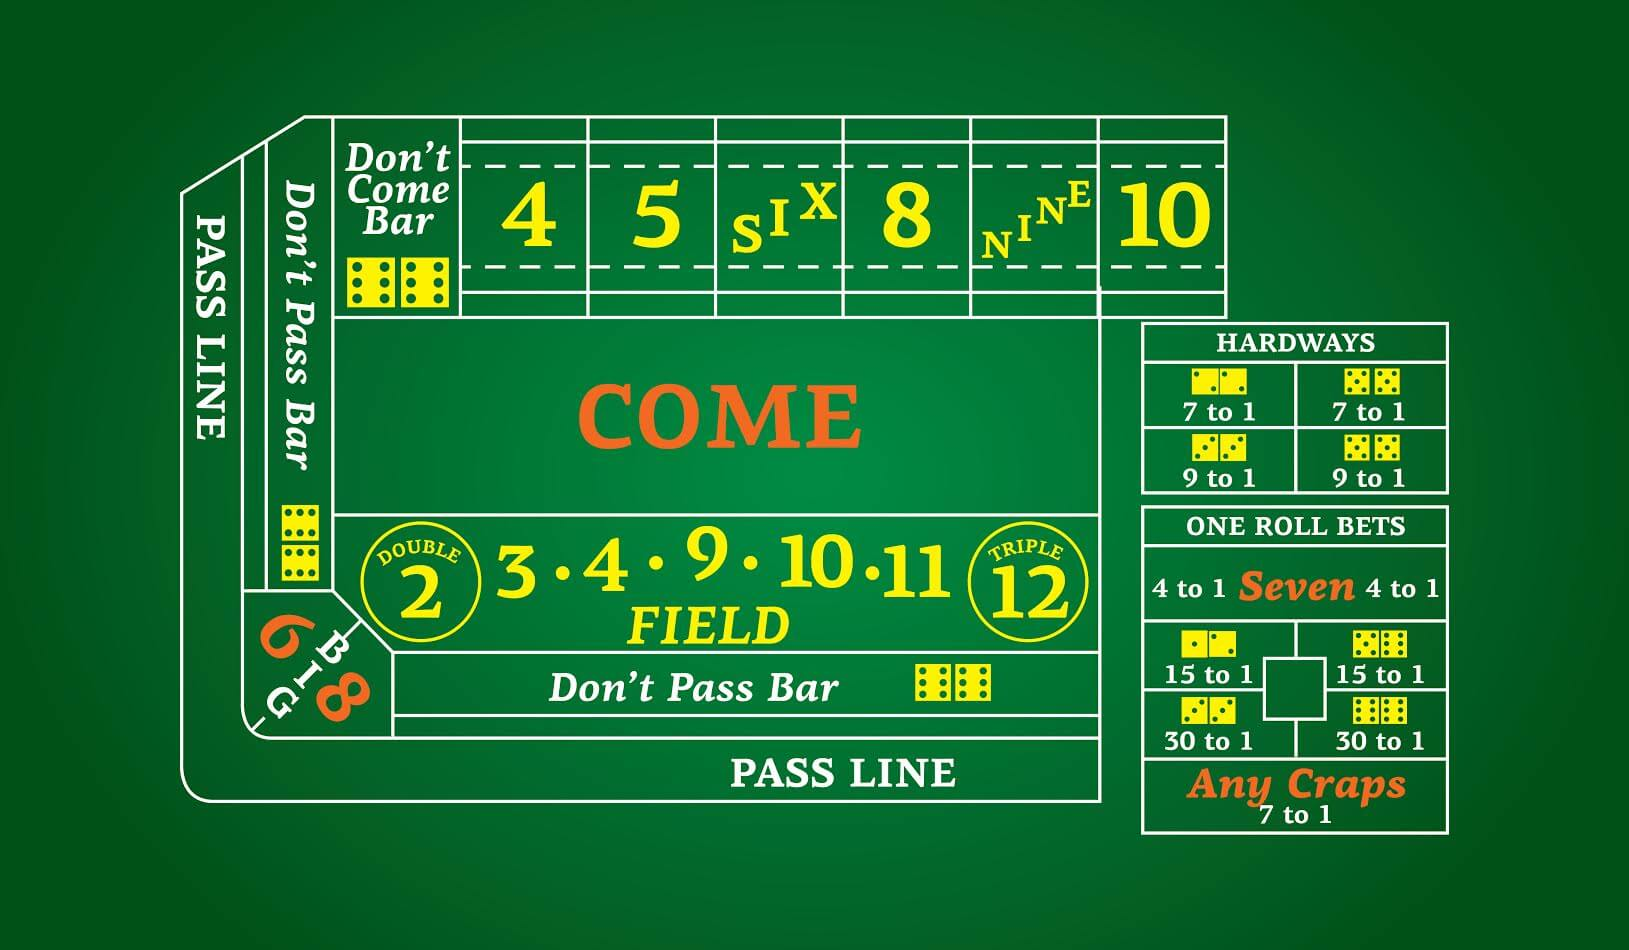 High stakes poker total winnings